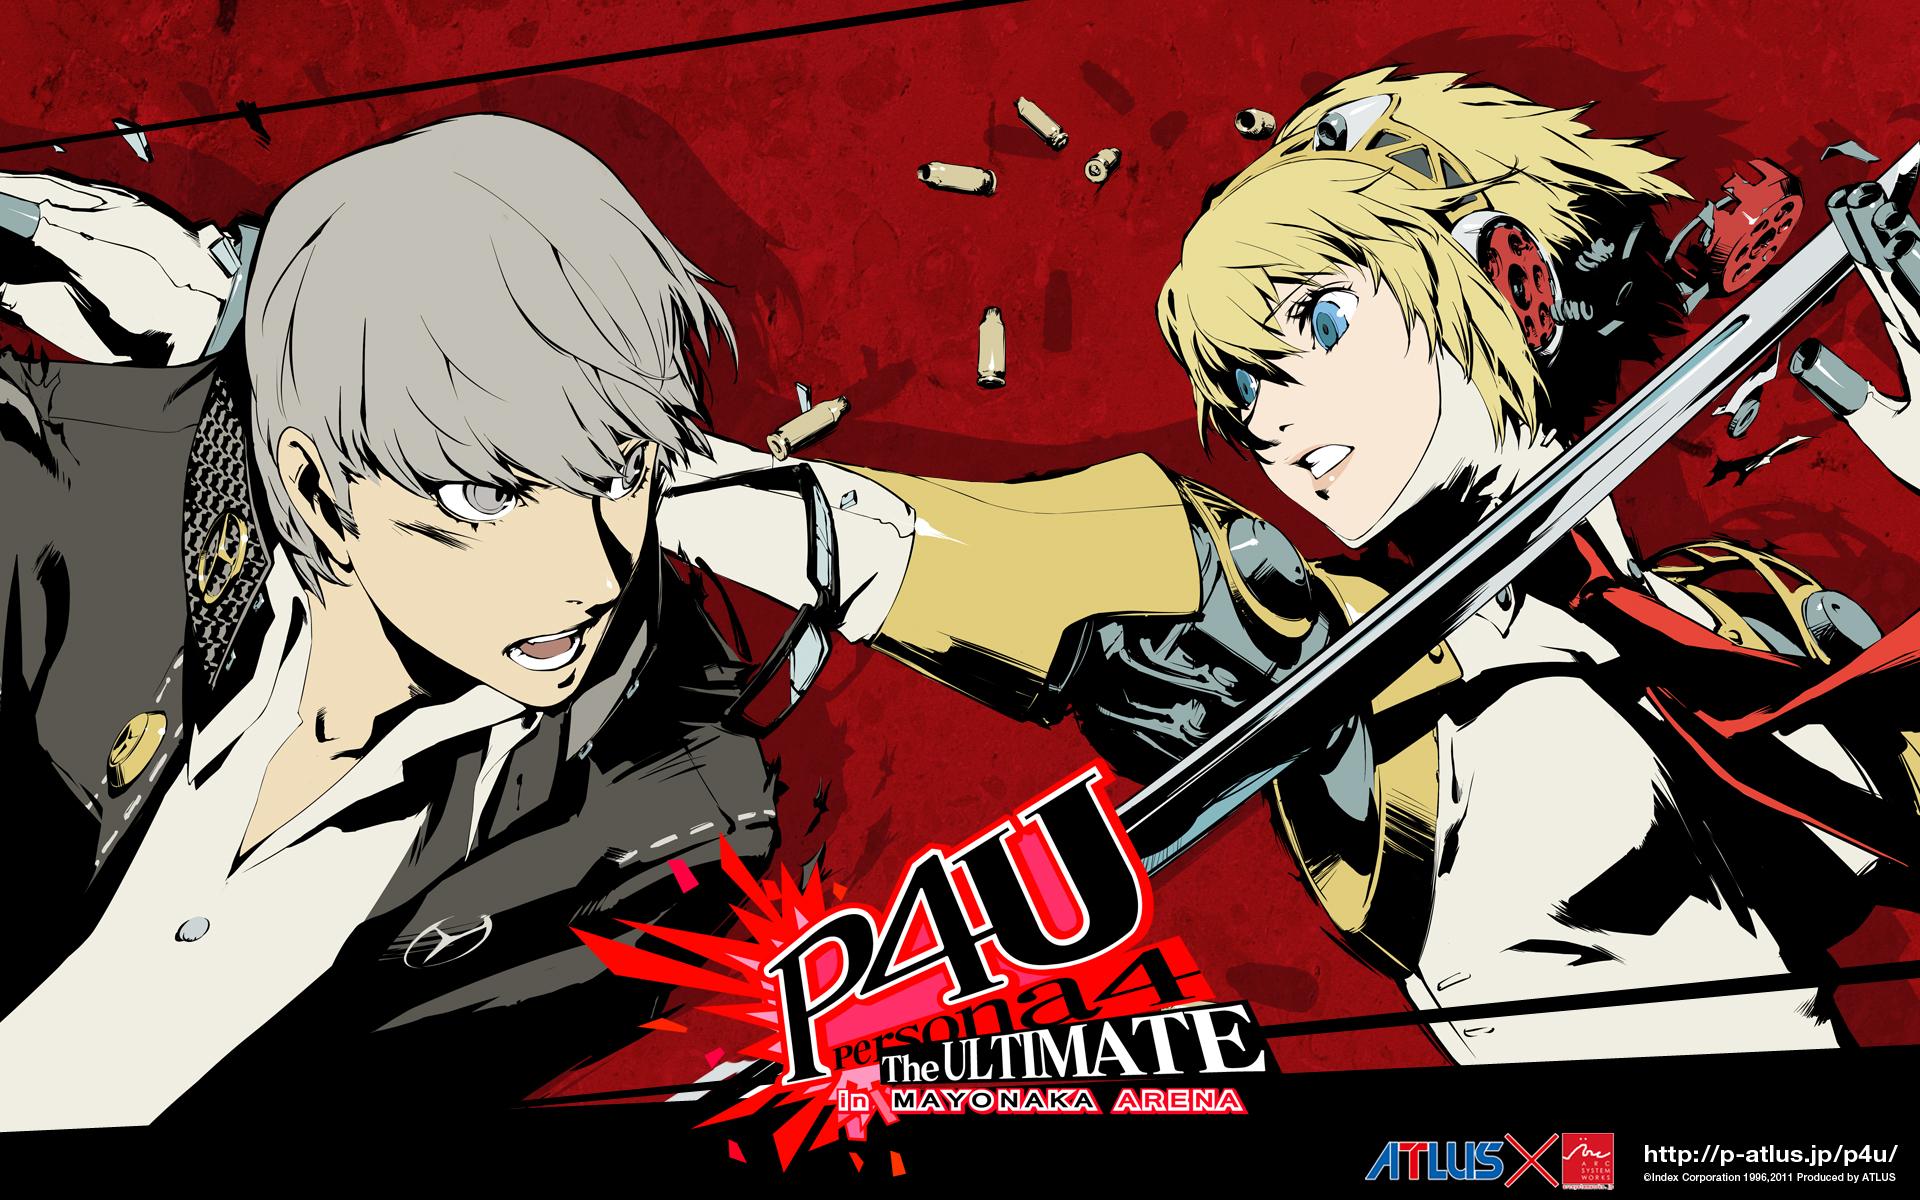 Persona 4 The Animation Wallpaper 34 Fav Persona 4 The Ultimate